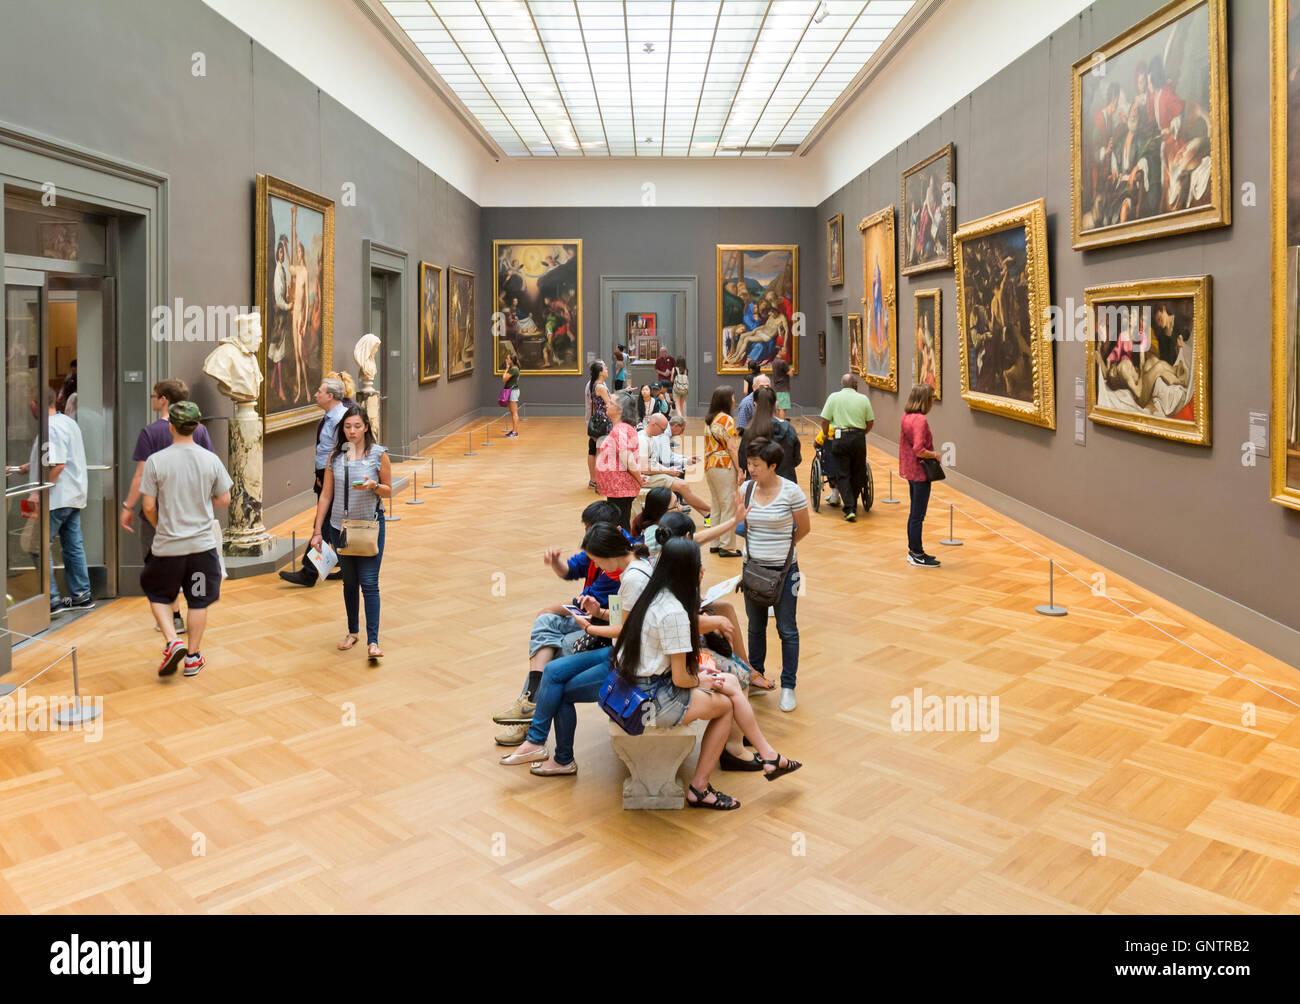 Visitors viewing artwork in the MOMA - the Metropolitan Museum of Art, Manhattan, New York City. - Stock Image